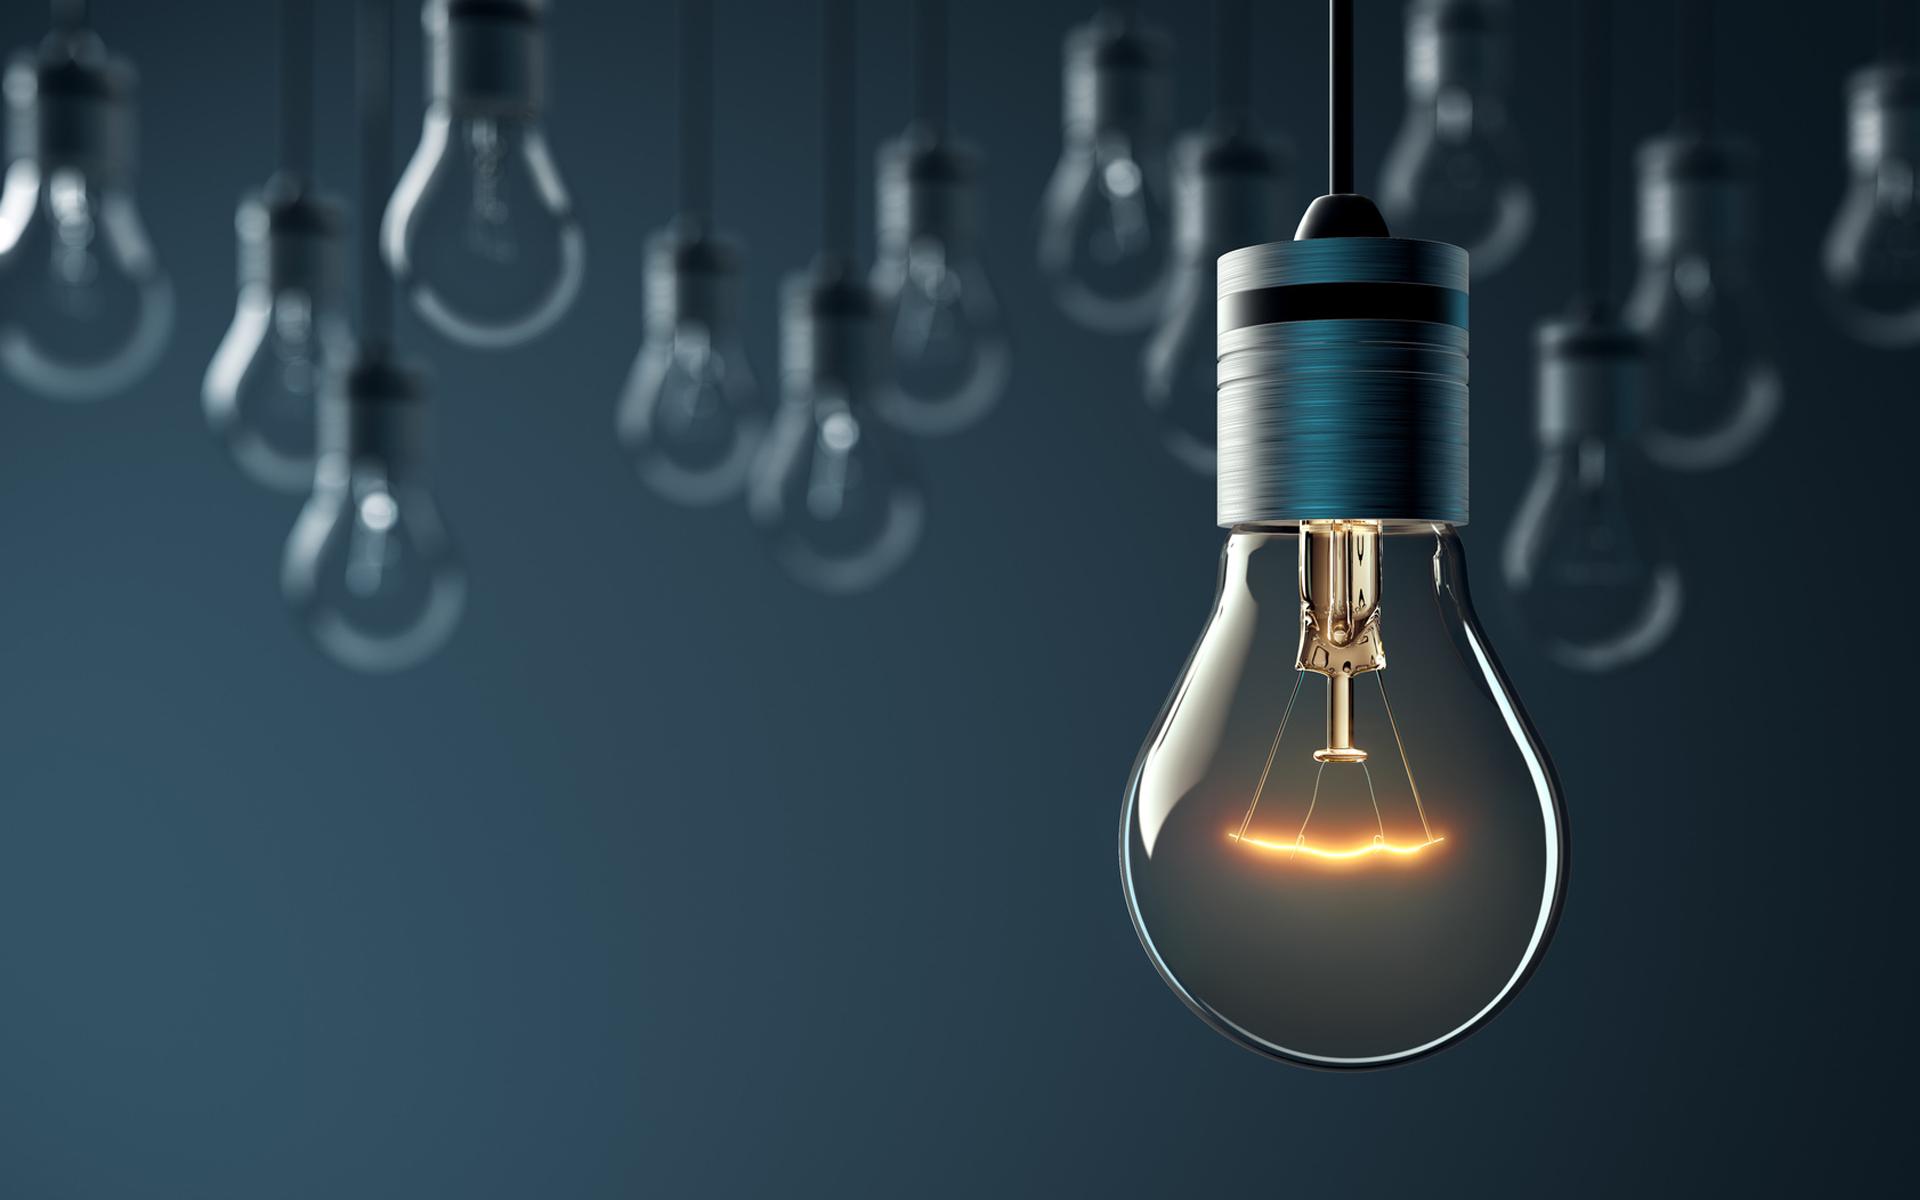 Lamping Systemtechnik